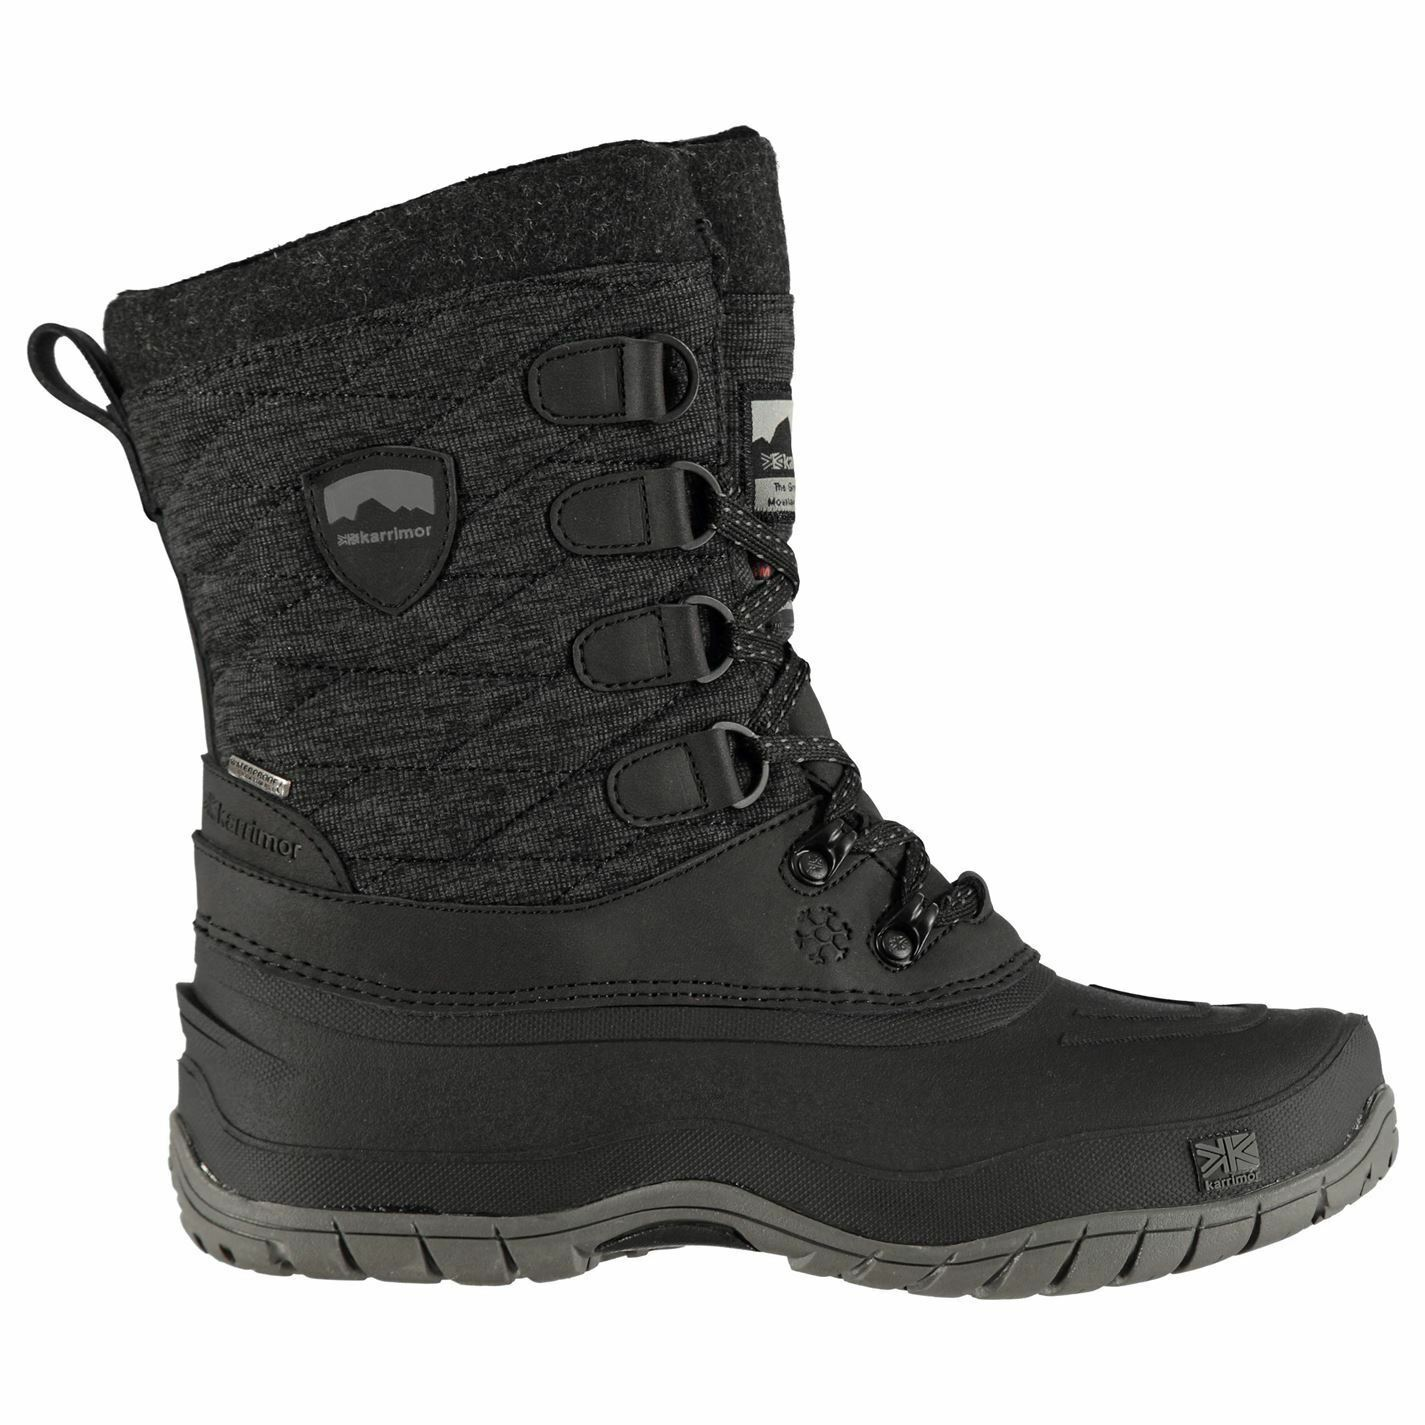 Karrimor Karrimor Karrimor Valerie Snowfur 3 Boots Ladies Snow shoes Laces Fastened Water 0edbab